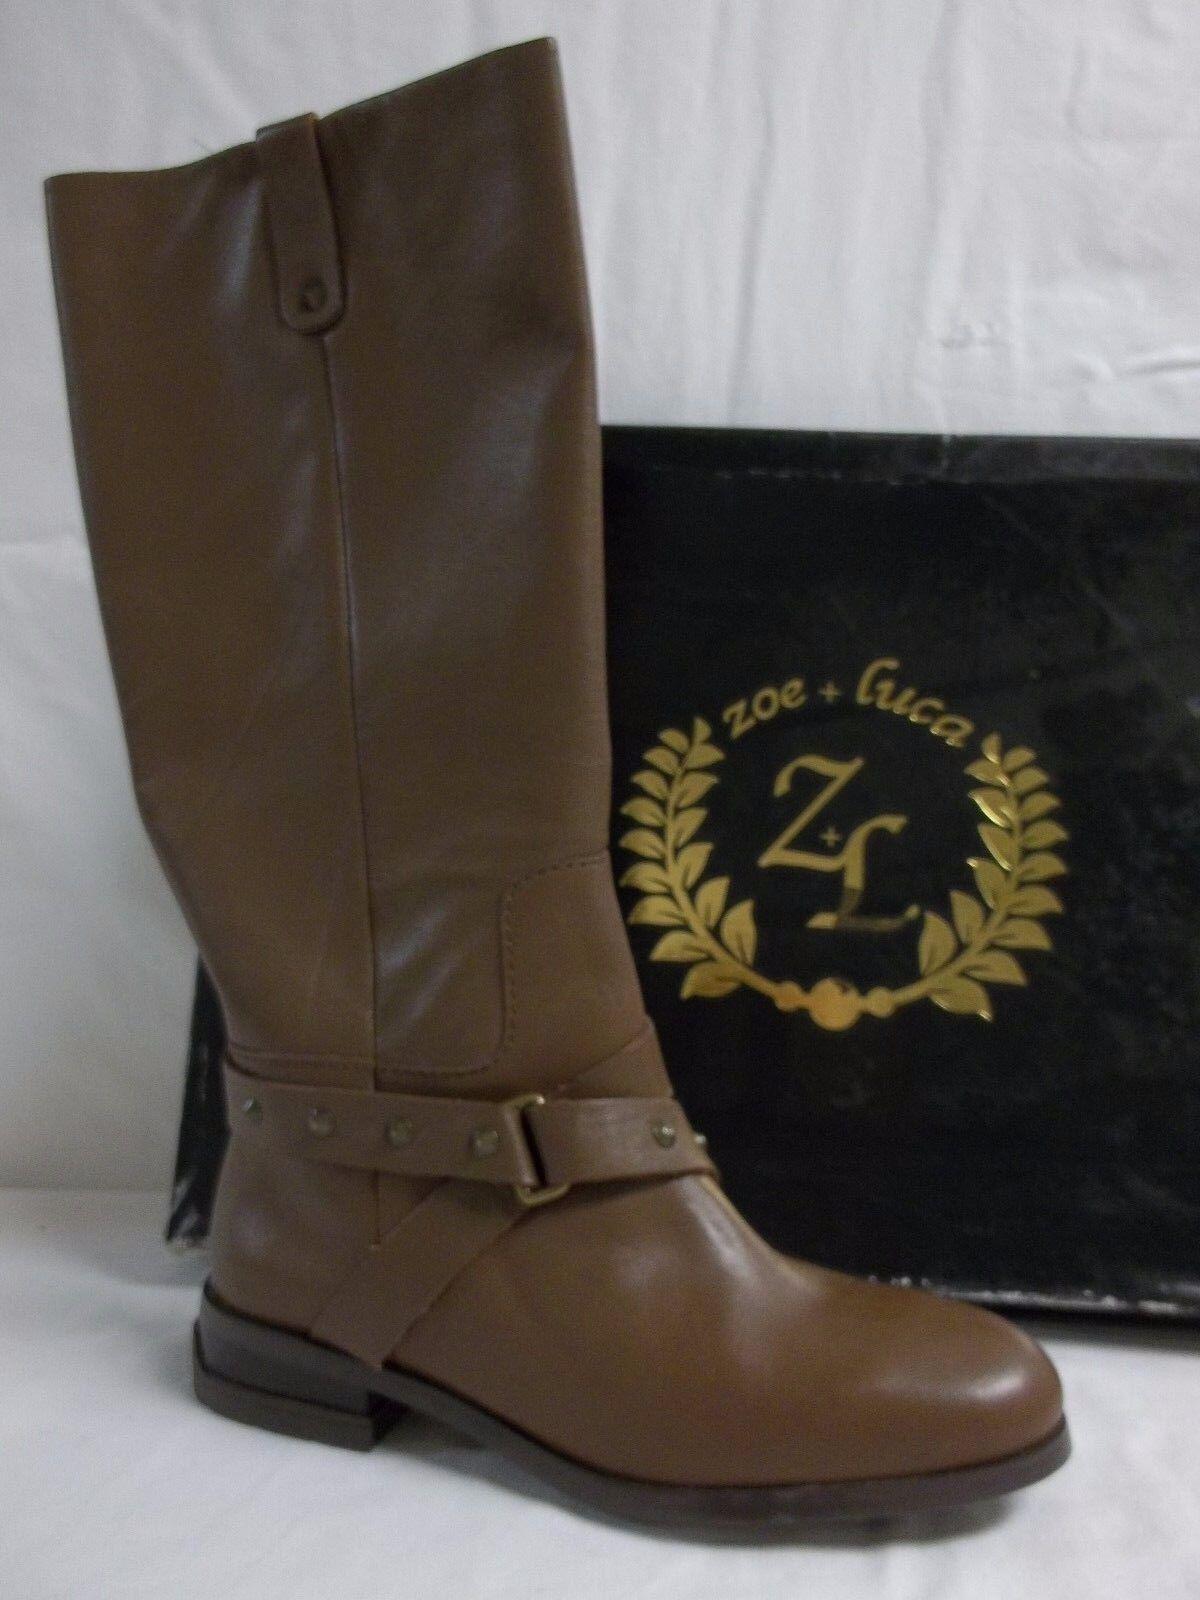 Zoe +  Luca Größe 6 M  + Lauren Brick Leder Knee High Stiefel New Damenschuhe Schuhes 083458